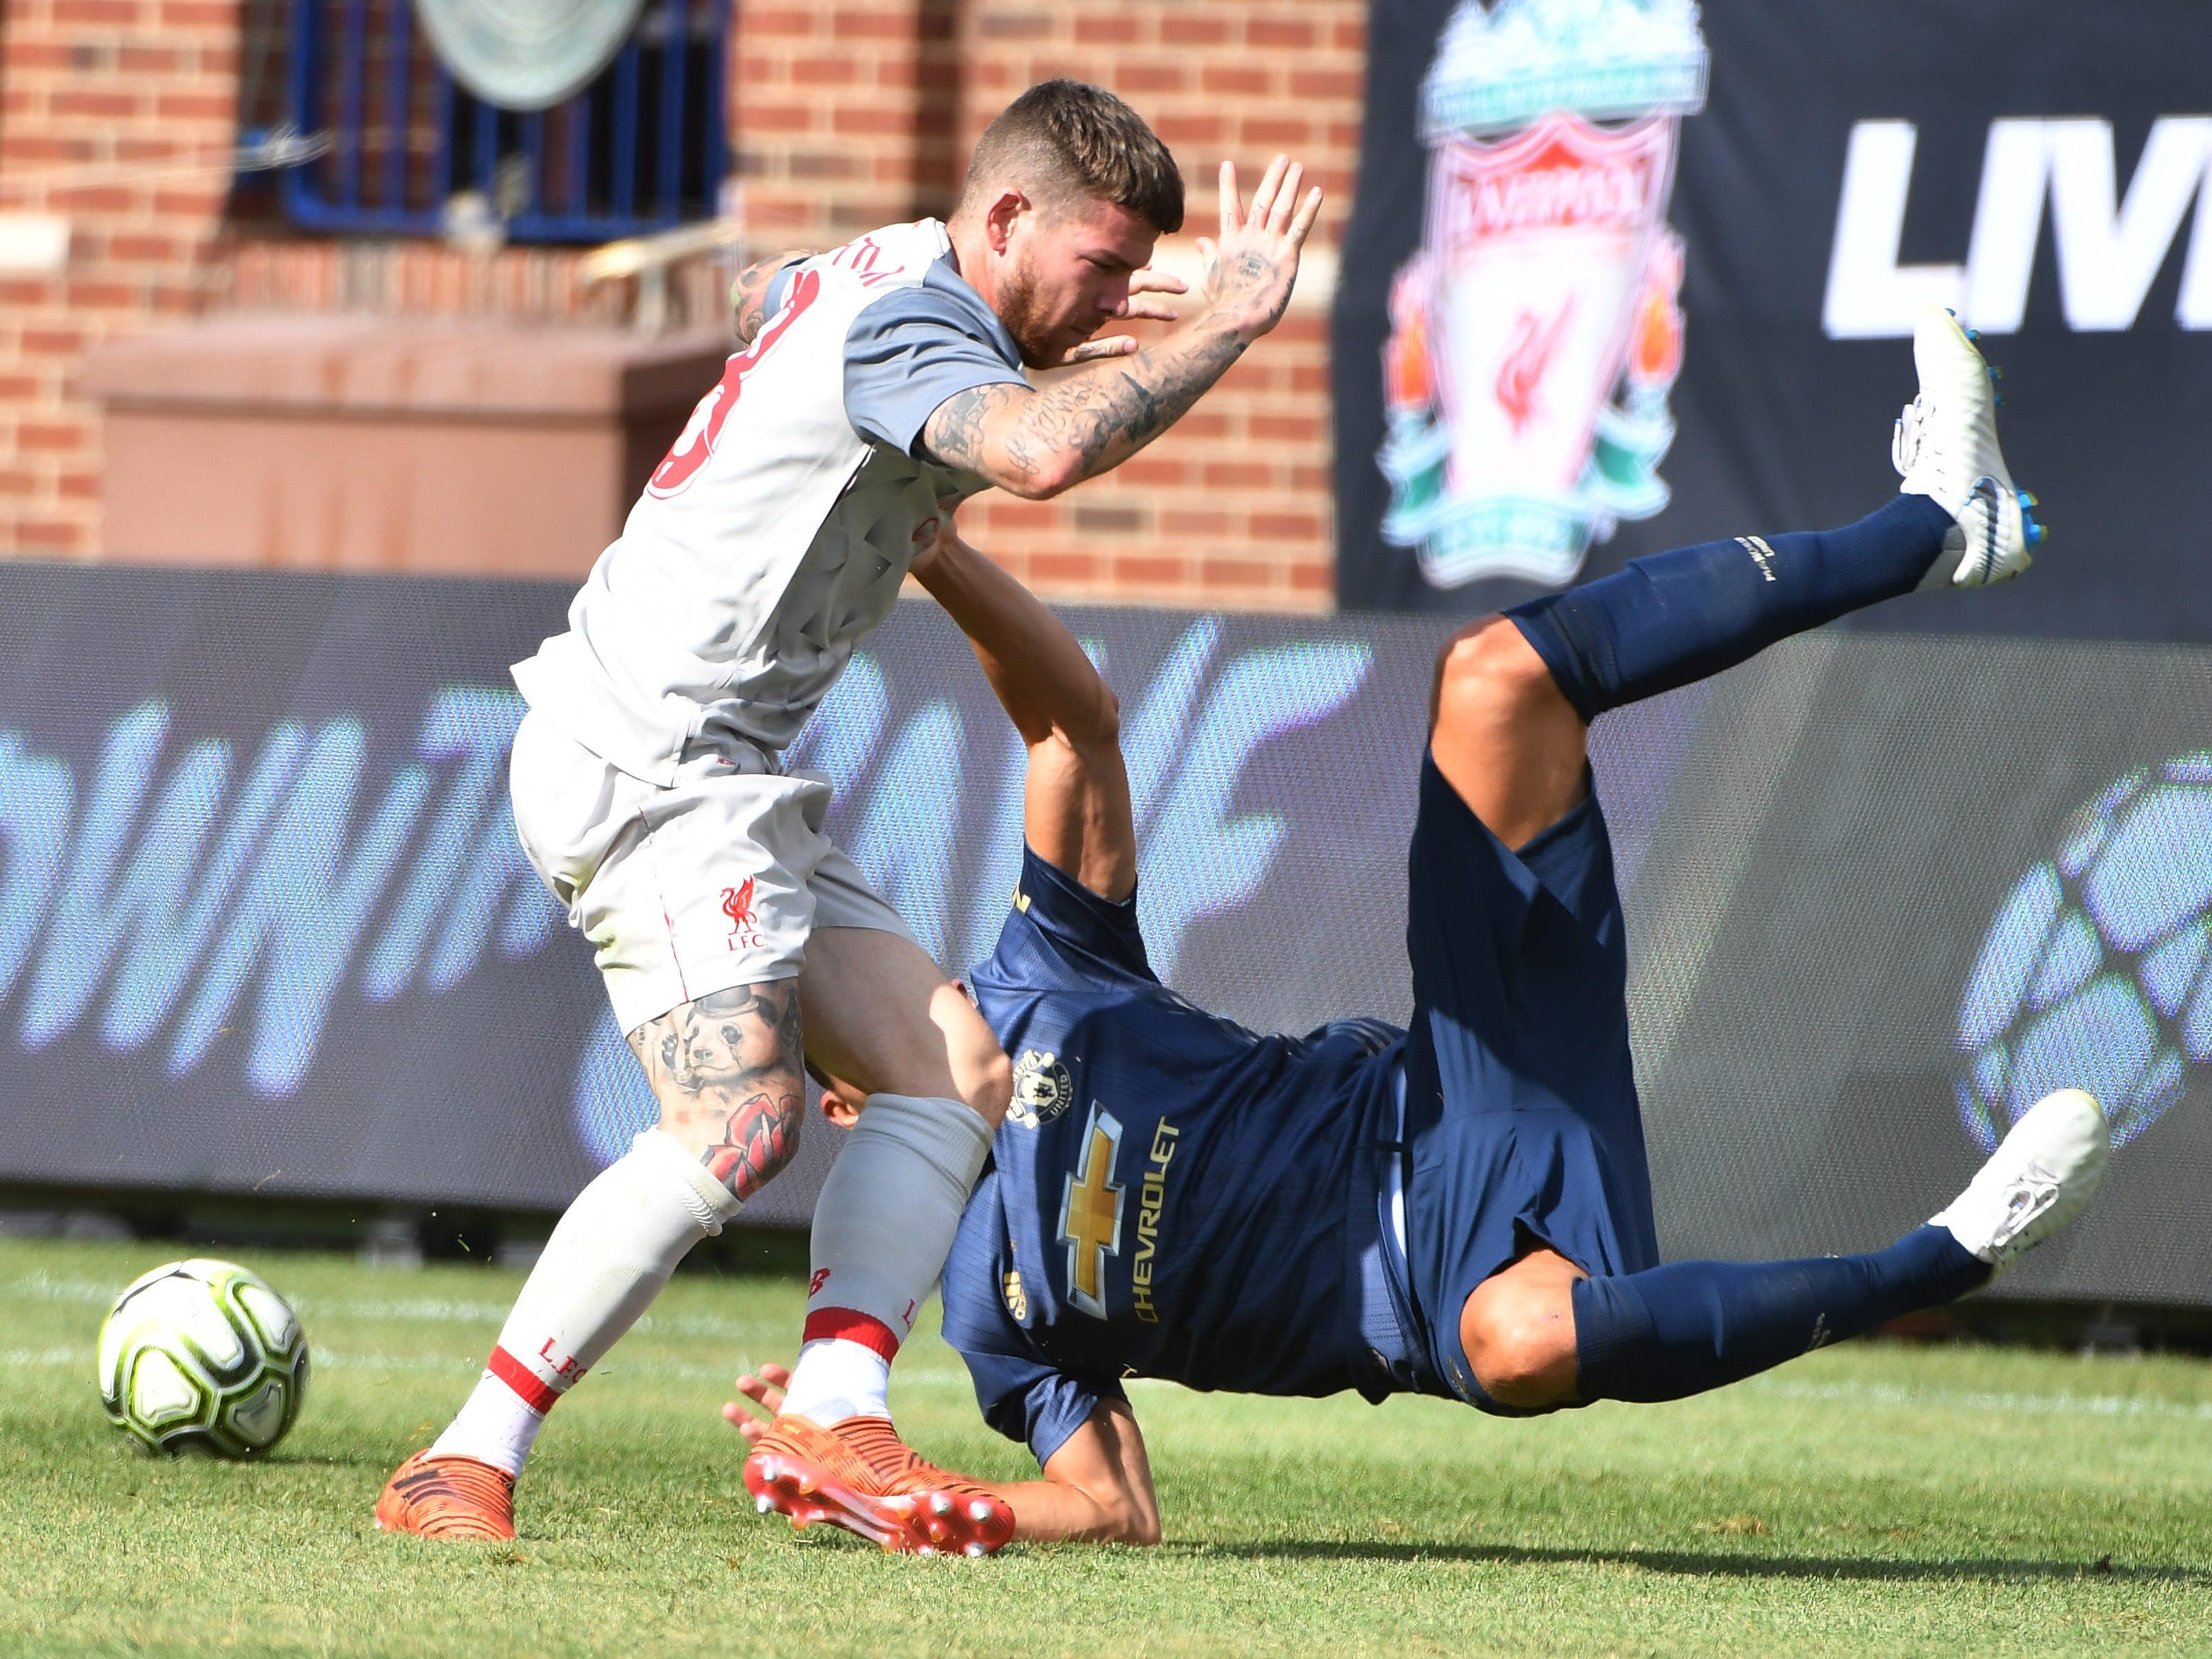 Liverpool's Alberto Moreno takes down Manchester's Matteo Darmian in the first half.